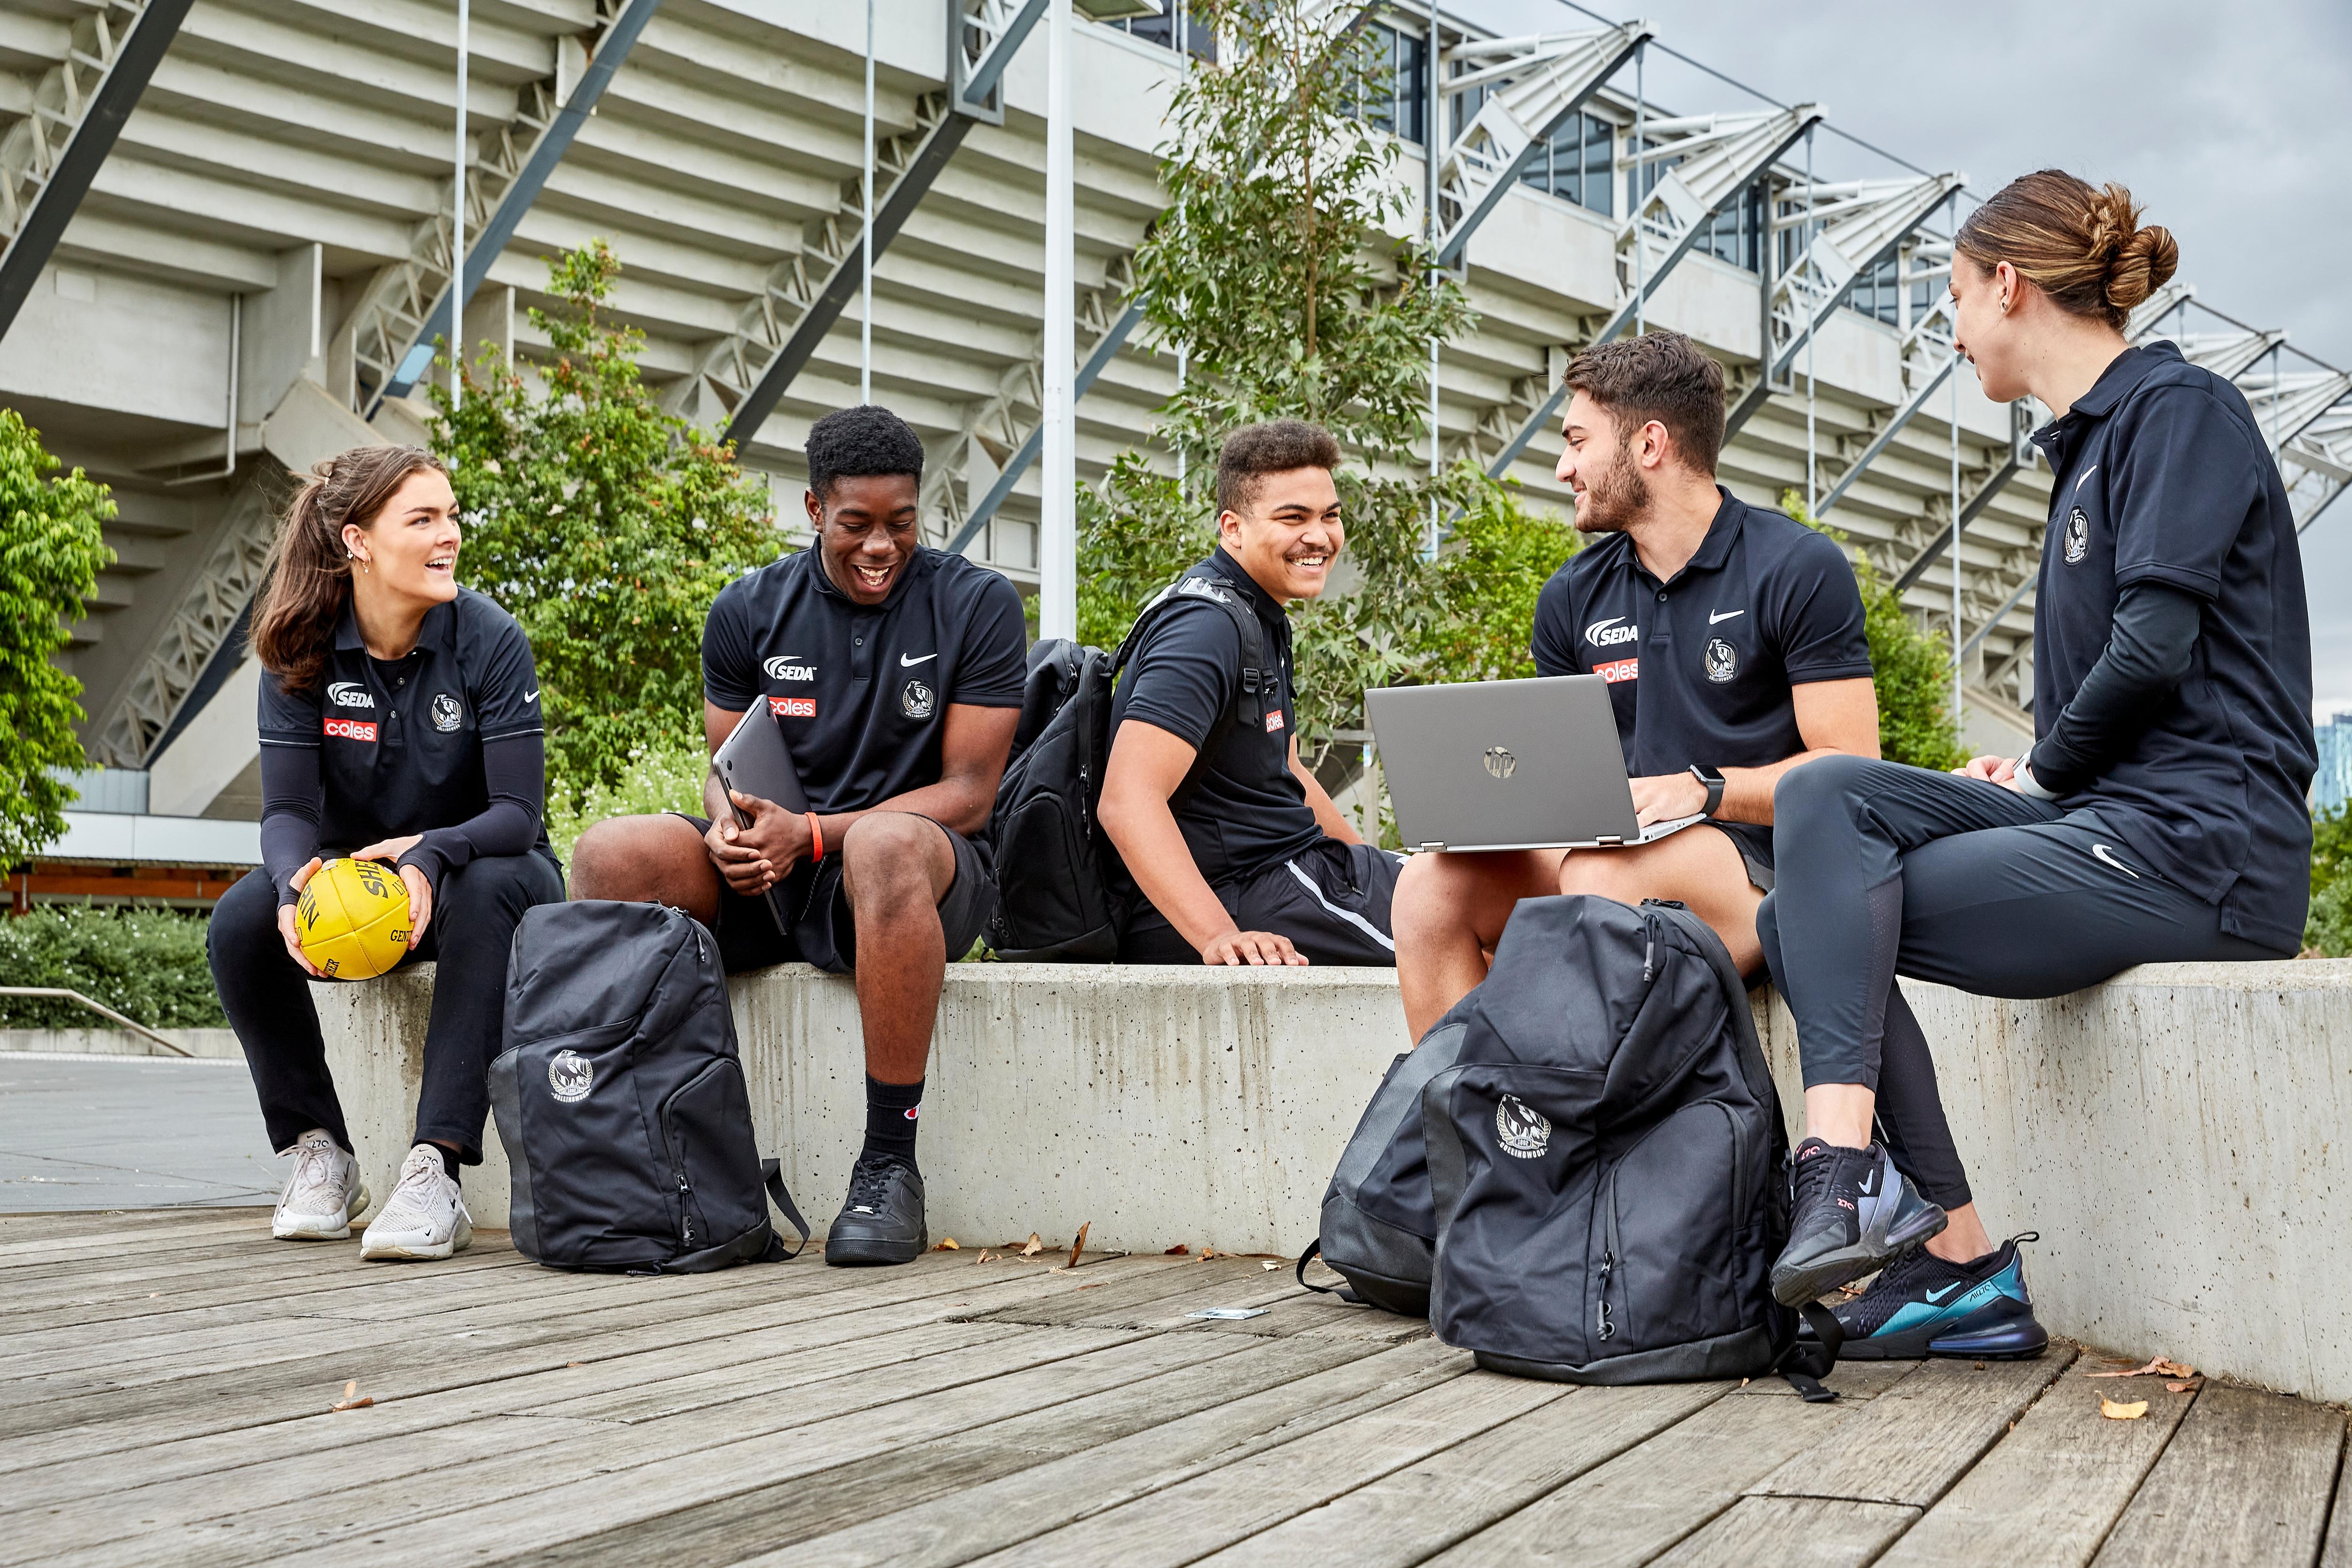 Students socialise